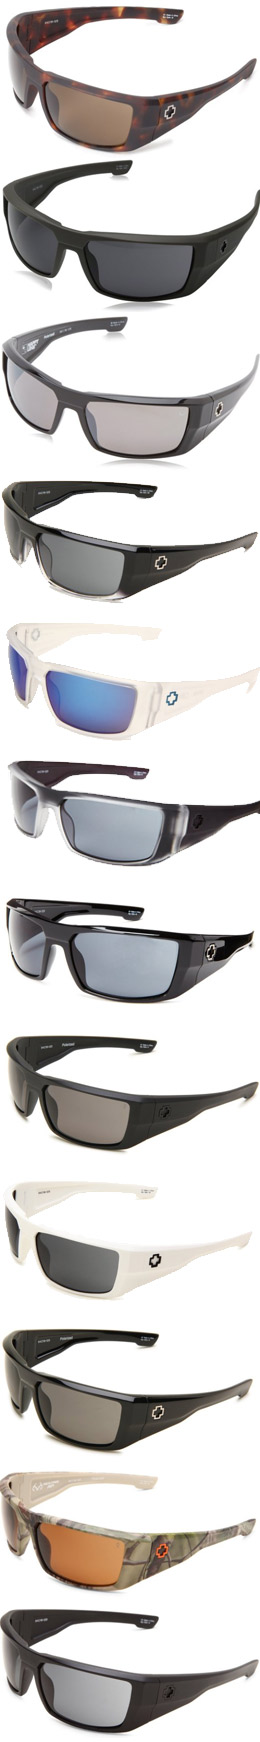 Spy Optic Dirk Design Options